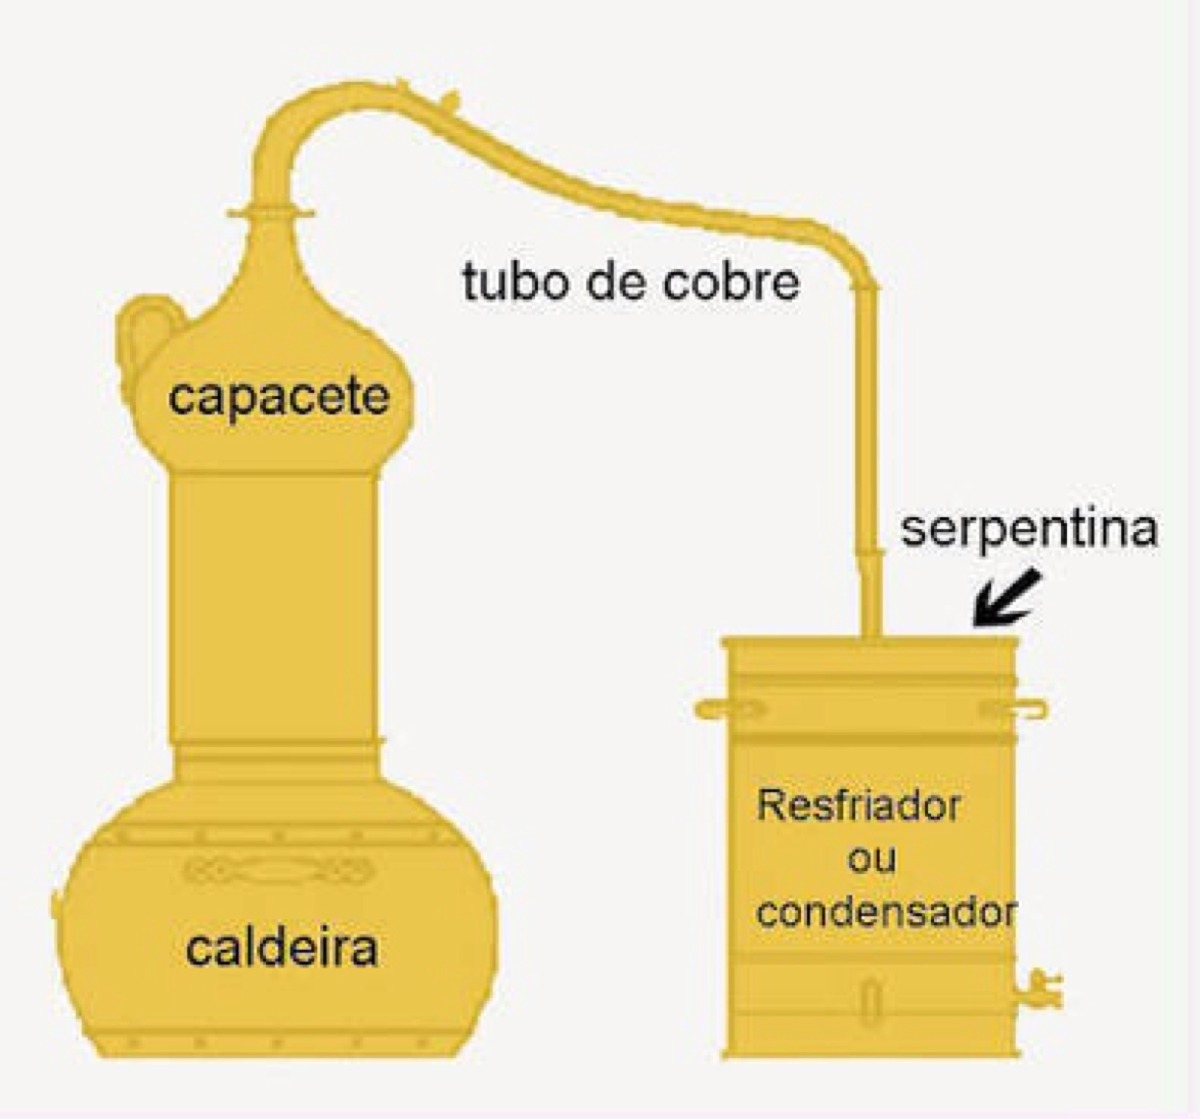 fabricar alambique: